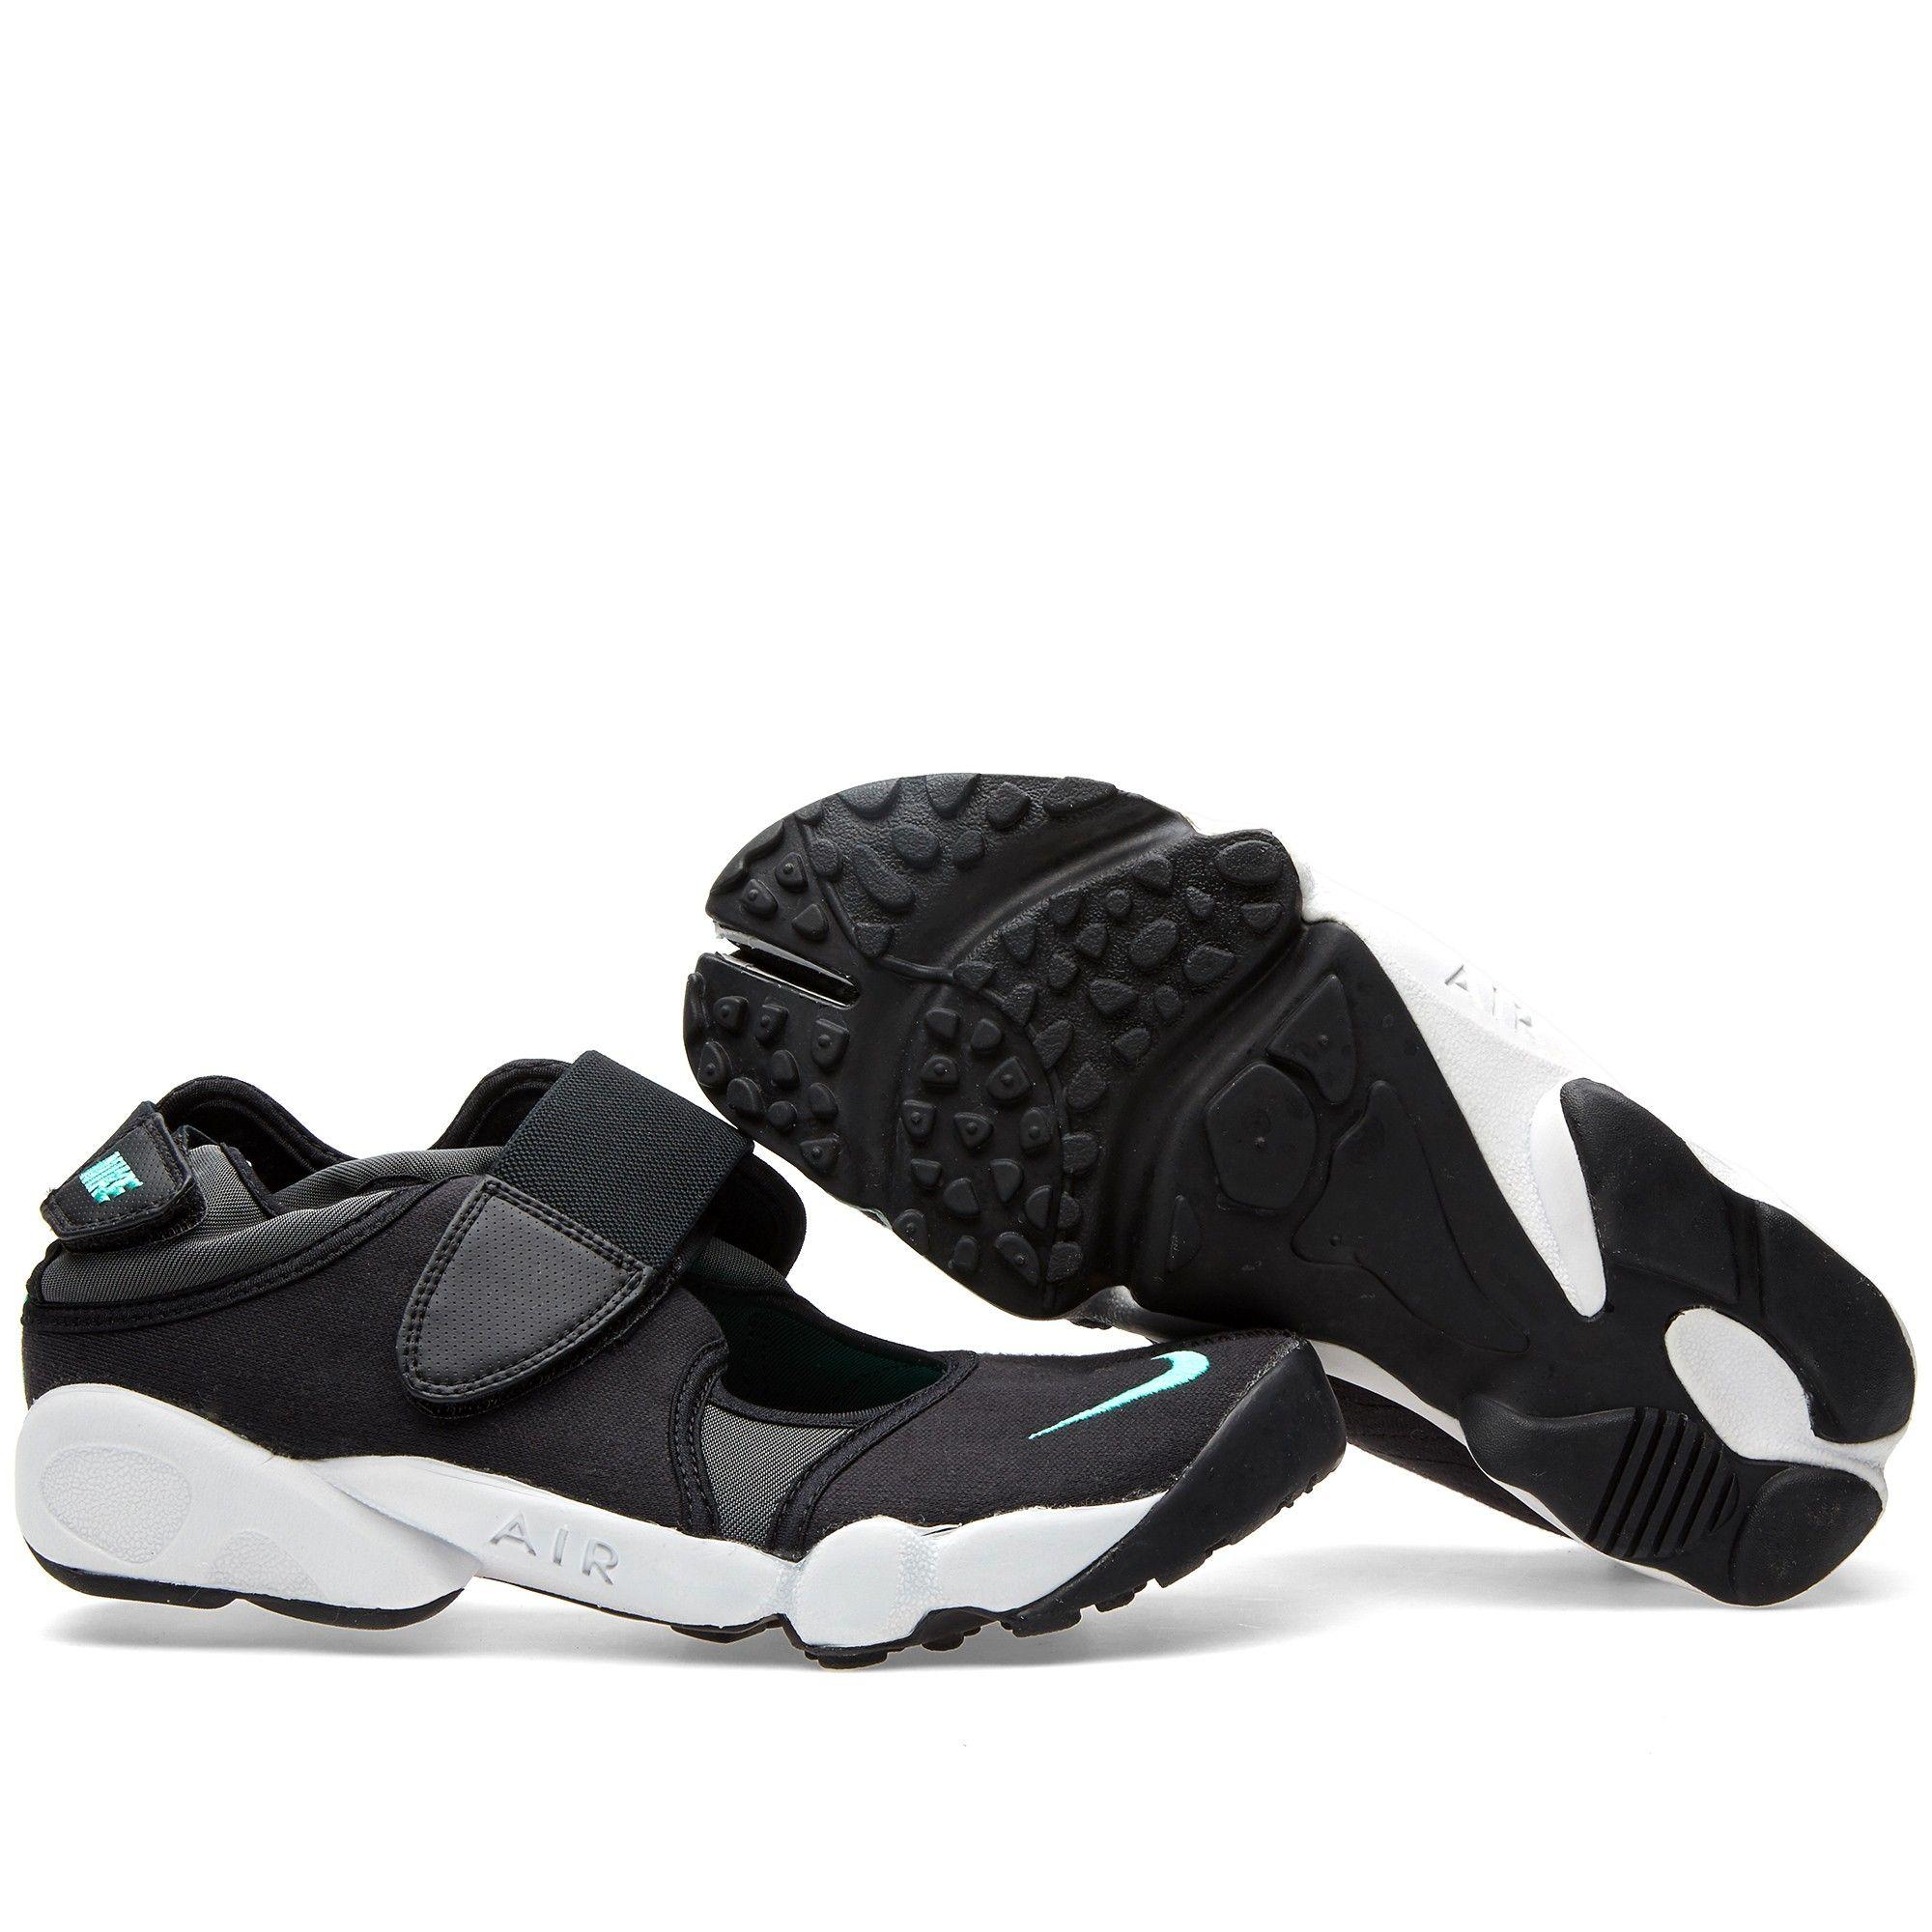 0365c4e2e8a5 Nike Air Rift (Black